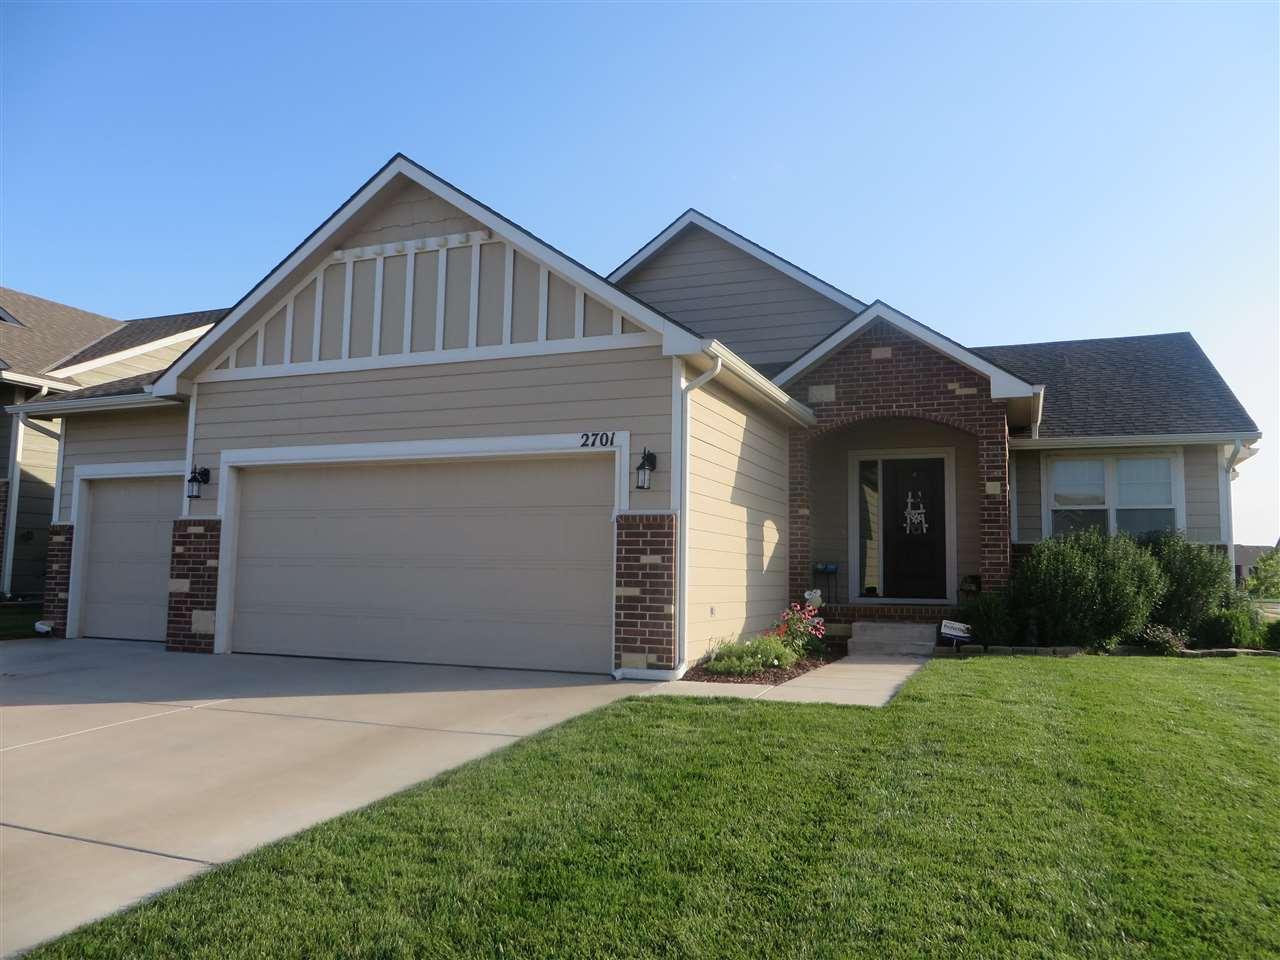 2701 S Westgate St, Wichita, KS 67215